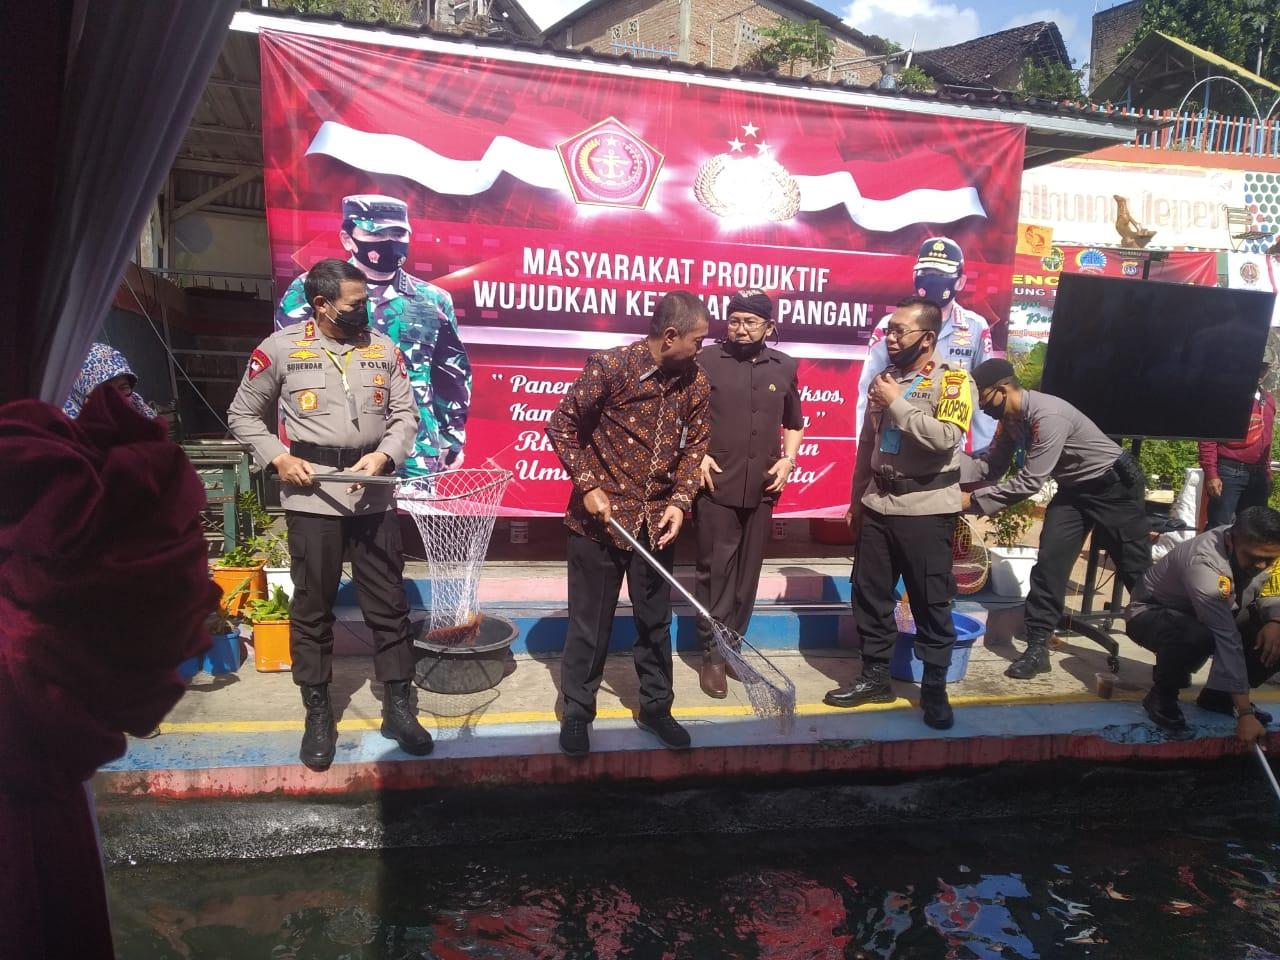 Panen Raya Ikan Kampung Tangguh Nusantara Rukun Kampung Ponggalan di Bendung Lepen Mrican Kelurahan Giwangan Kecamatan Umbulharjo